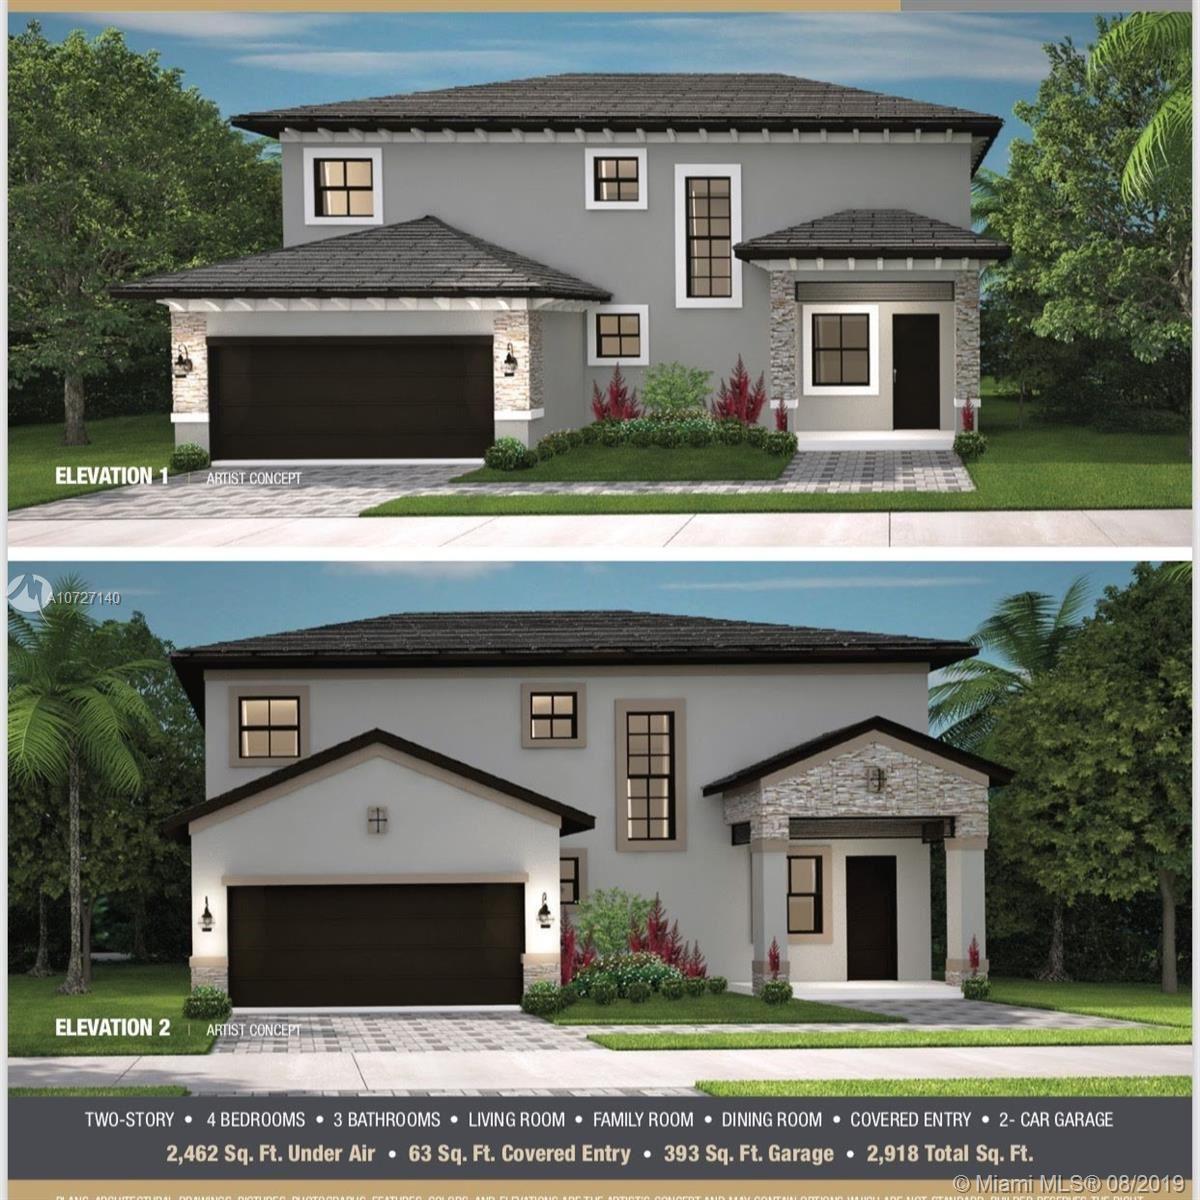 16917 SW 109th Pl, Miami, FL 33157 - MLS#: A10727140